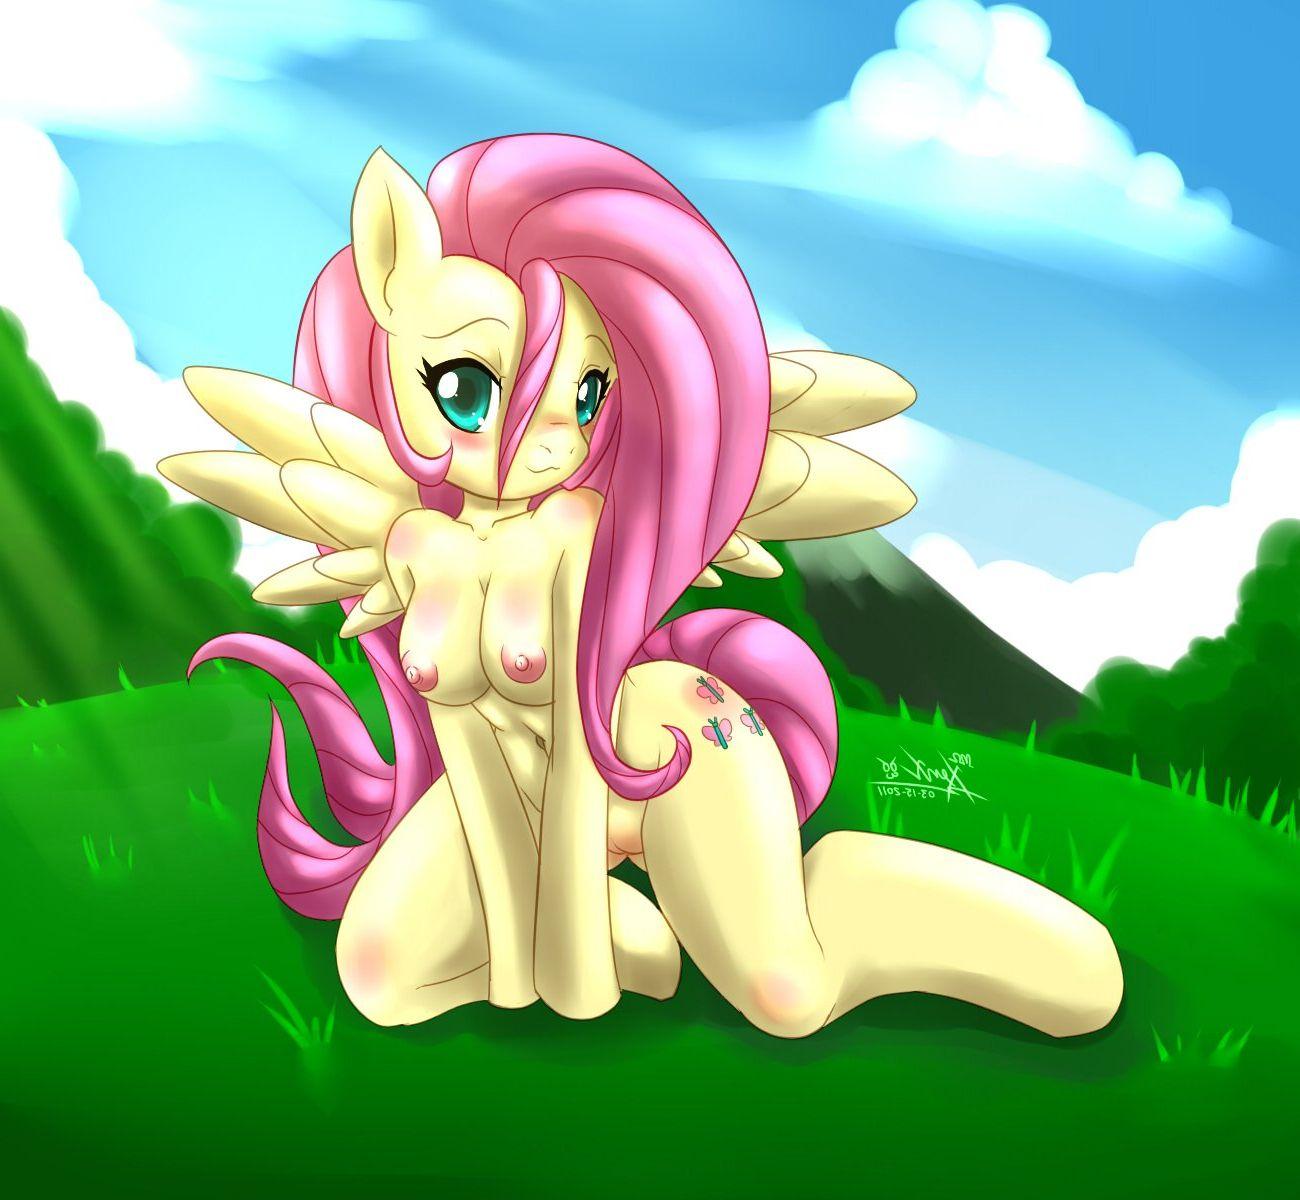 little-pony image_26986.jpg